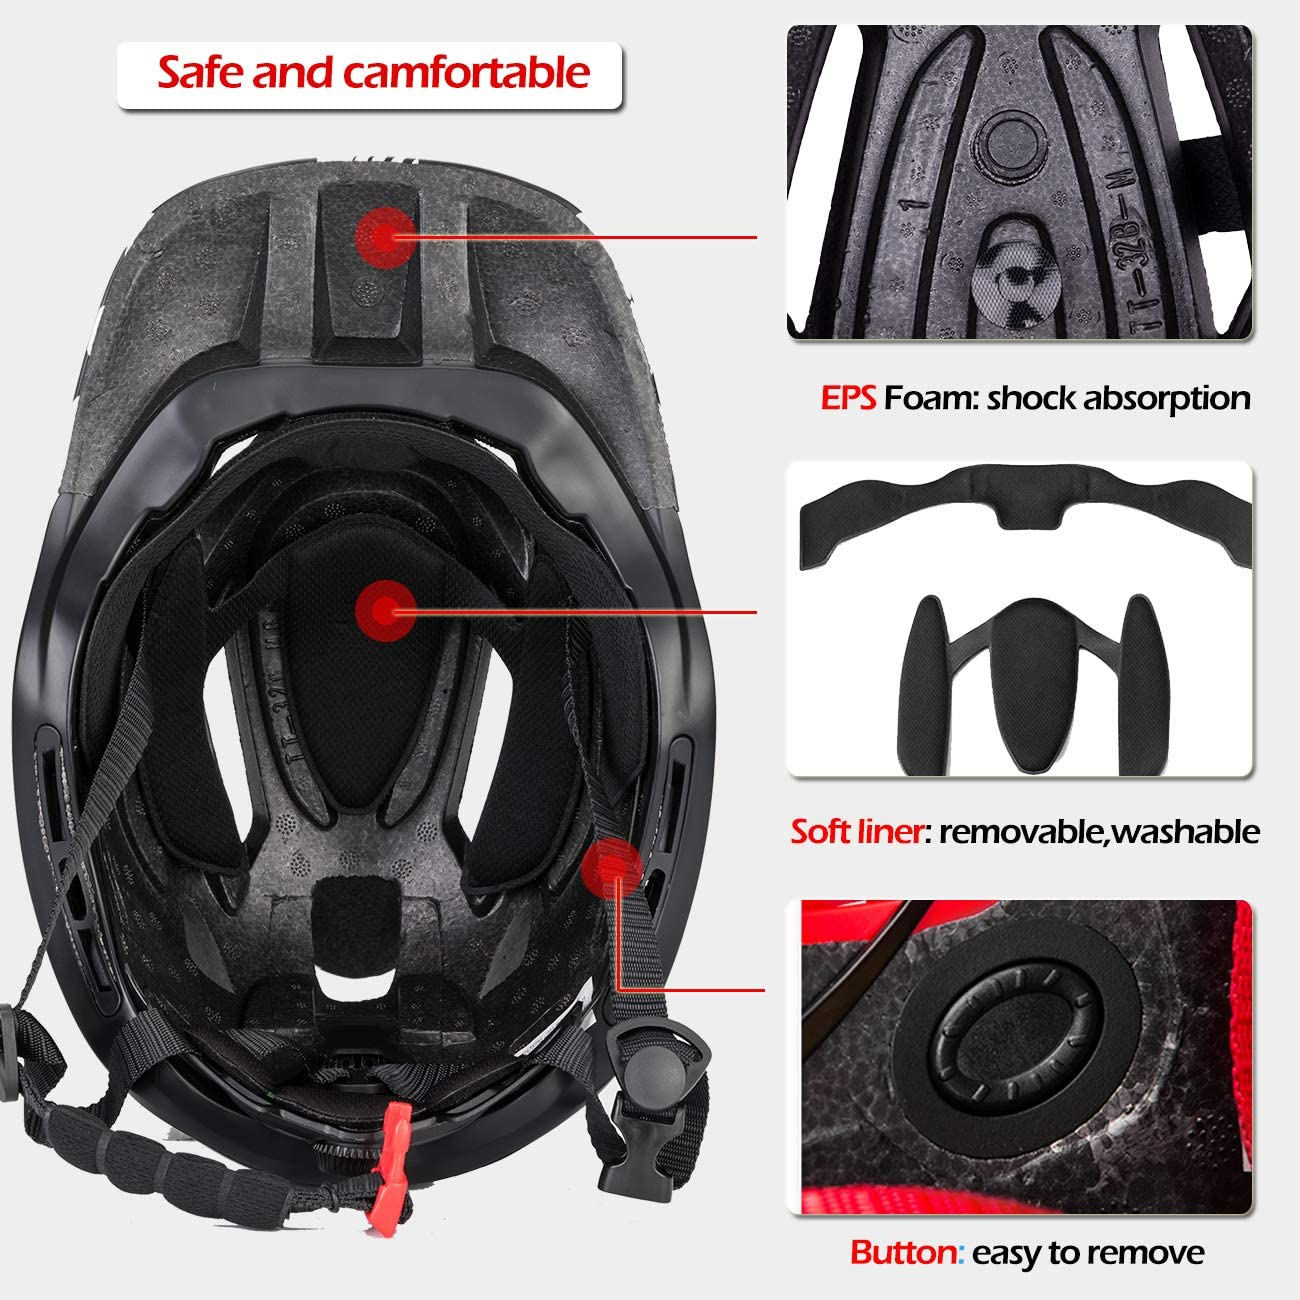 ROCKBROS Kinderhelm Integriert Fahrradhelm Kinder Jugend Fullface Helm mit Abnehmbarem Kinnschutz S 48-53cm M 53-58cm Downhill Helm Lila S (48-53CM)